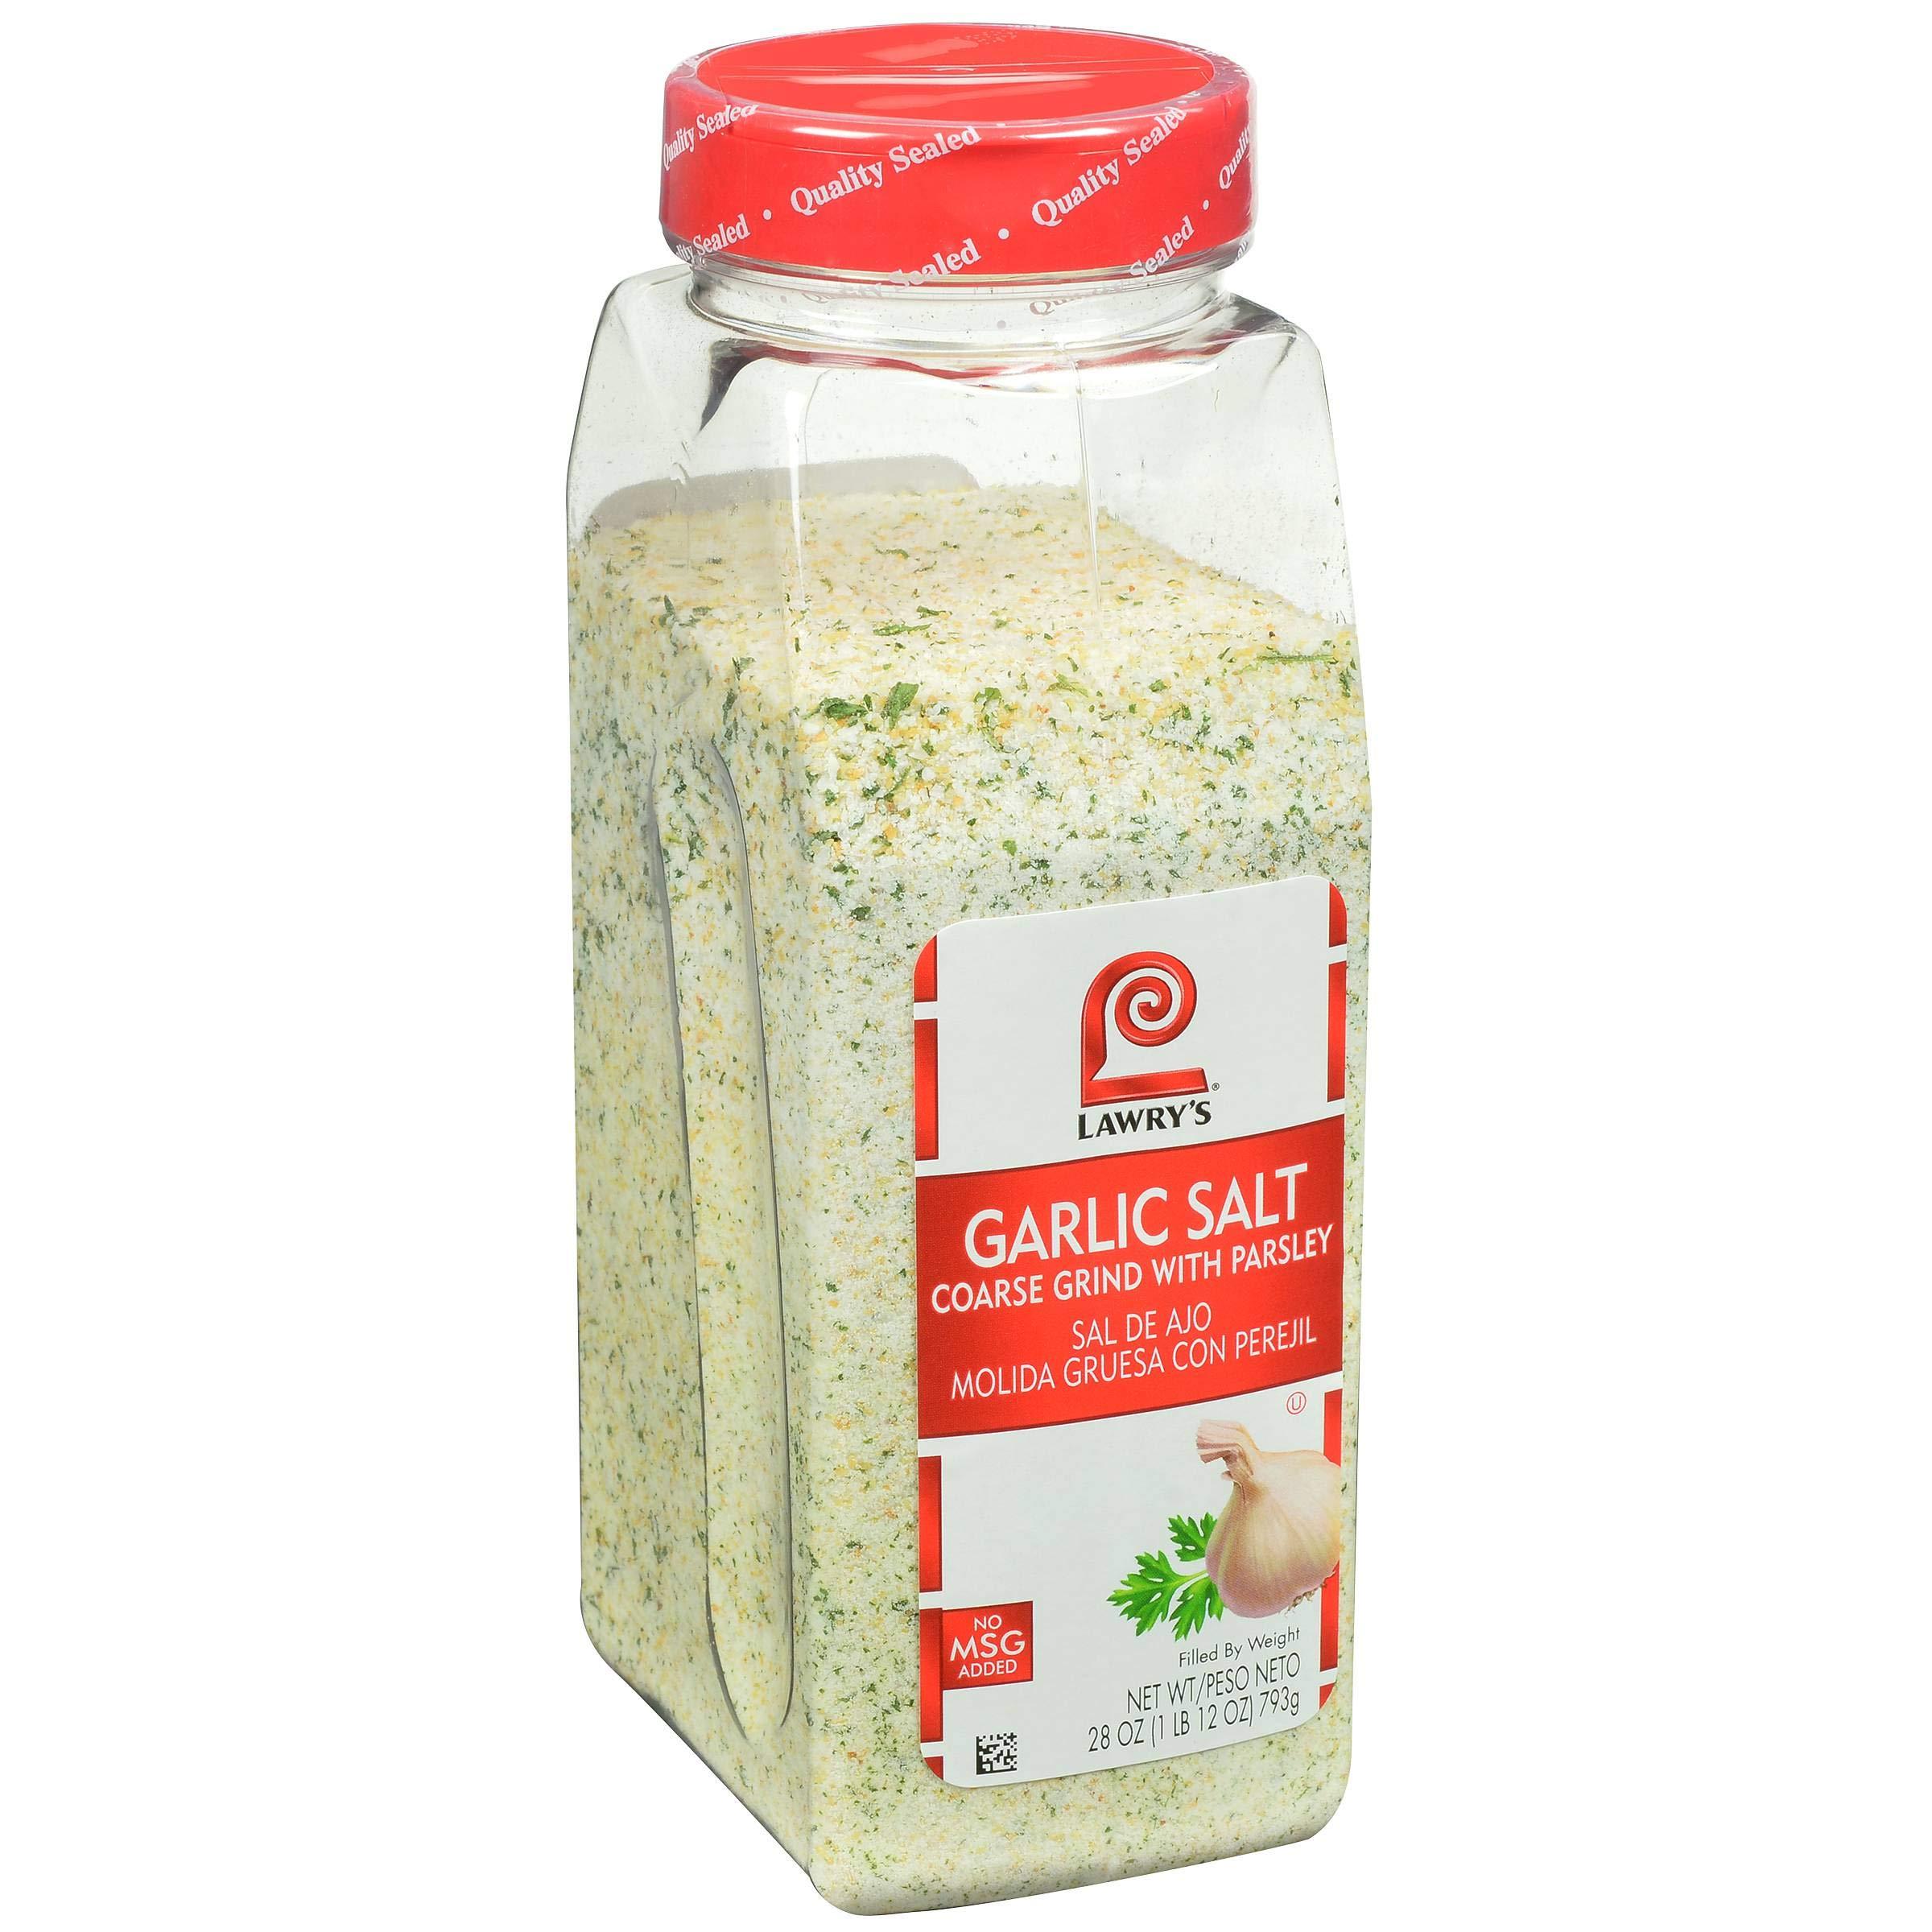 Lawrys Coarse Ground Garlic Salt with Parsley, 28 Ounce